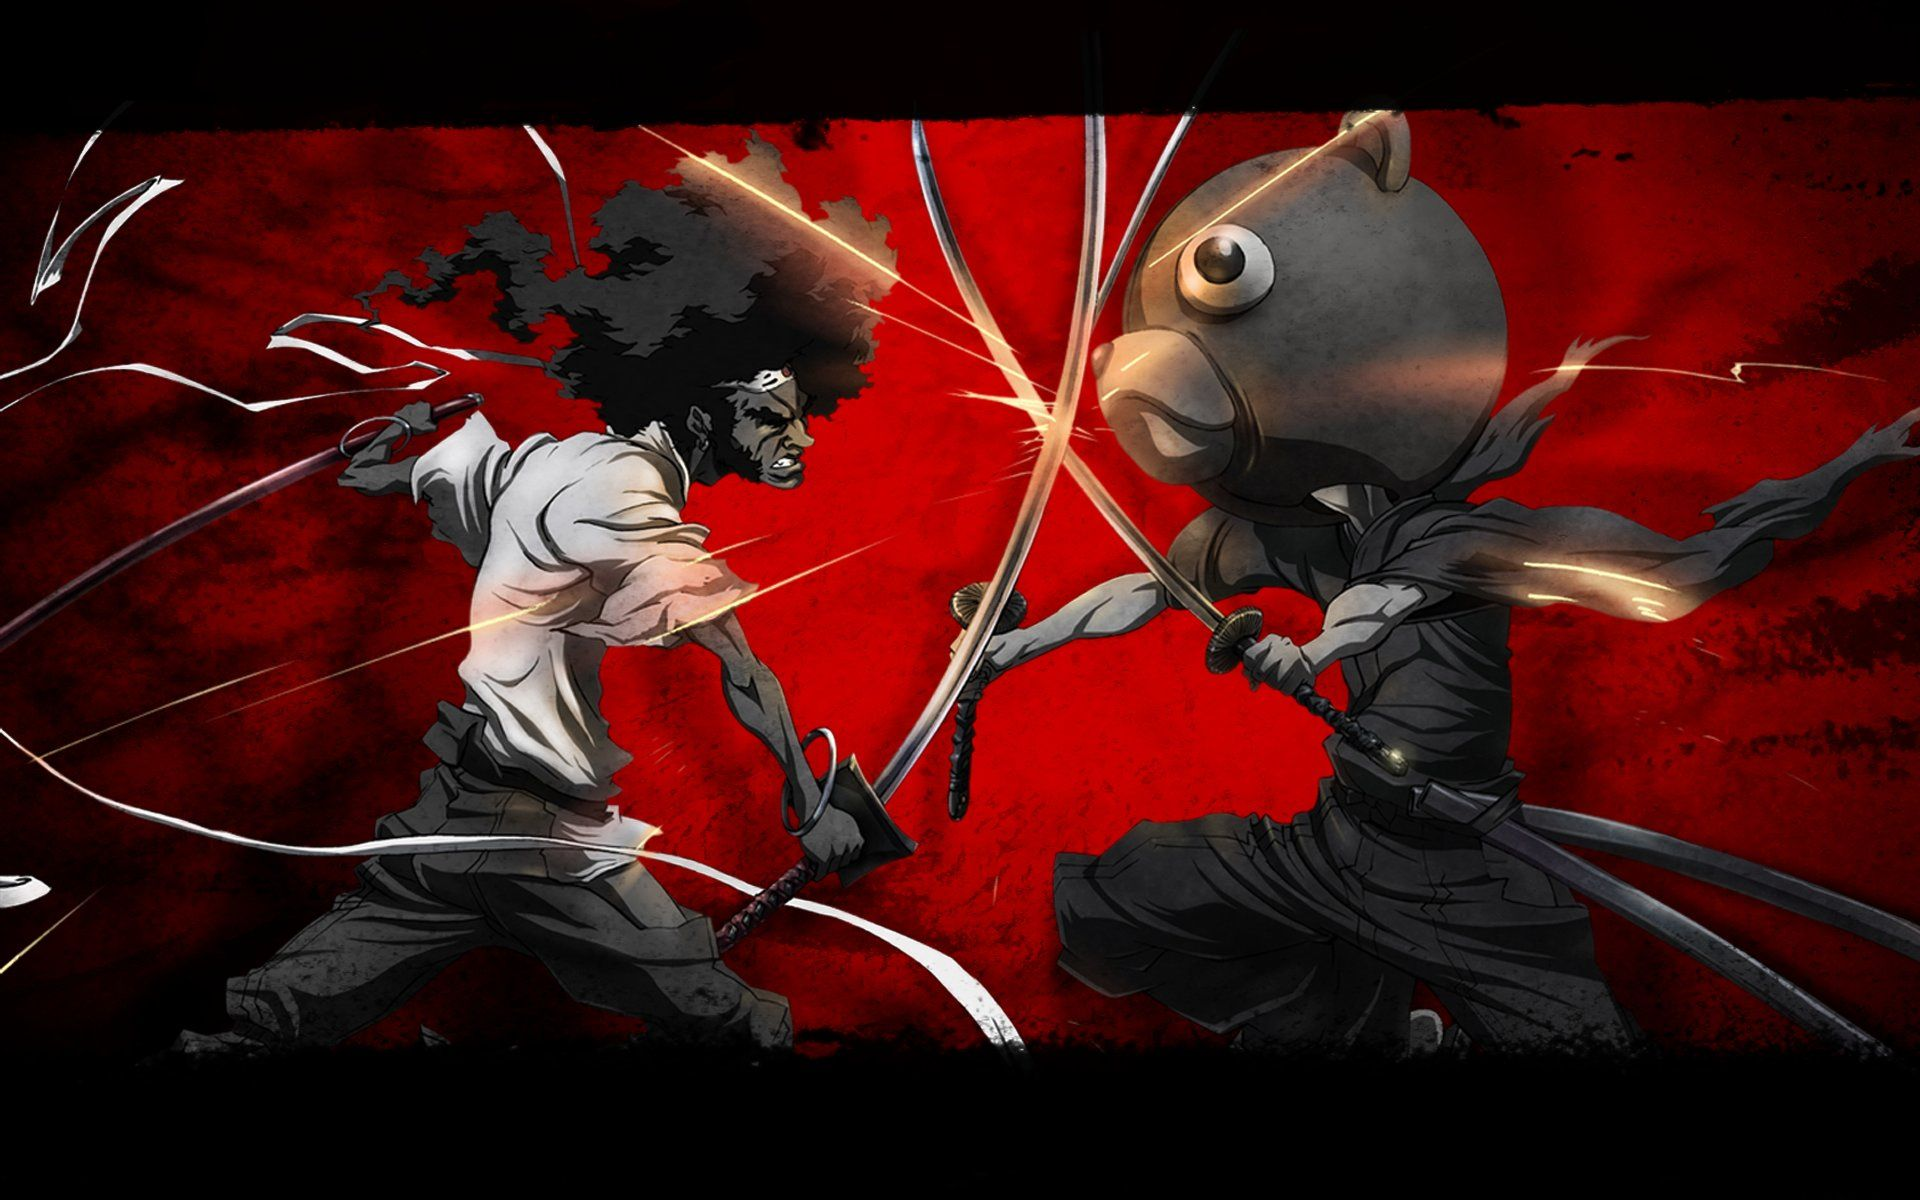 Epic Anime Fighting Wallpaper High Quality Resolution Afro Samurai Samurai Art Anime High resolution epic anime wallpaper hd